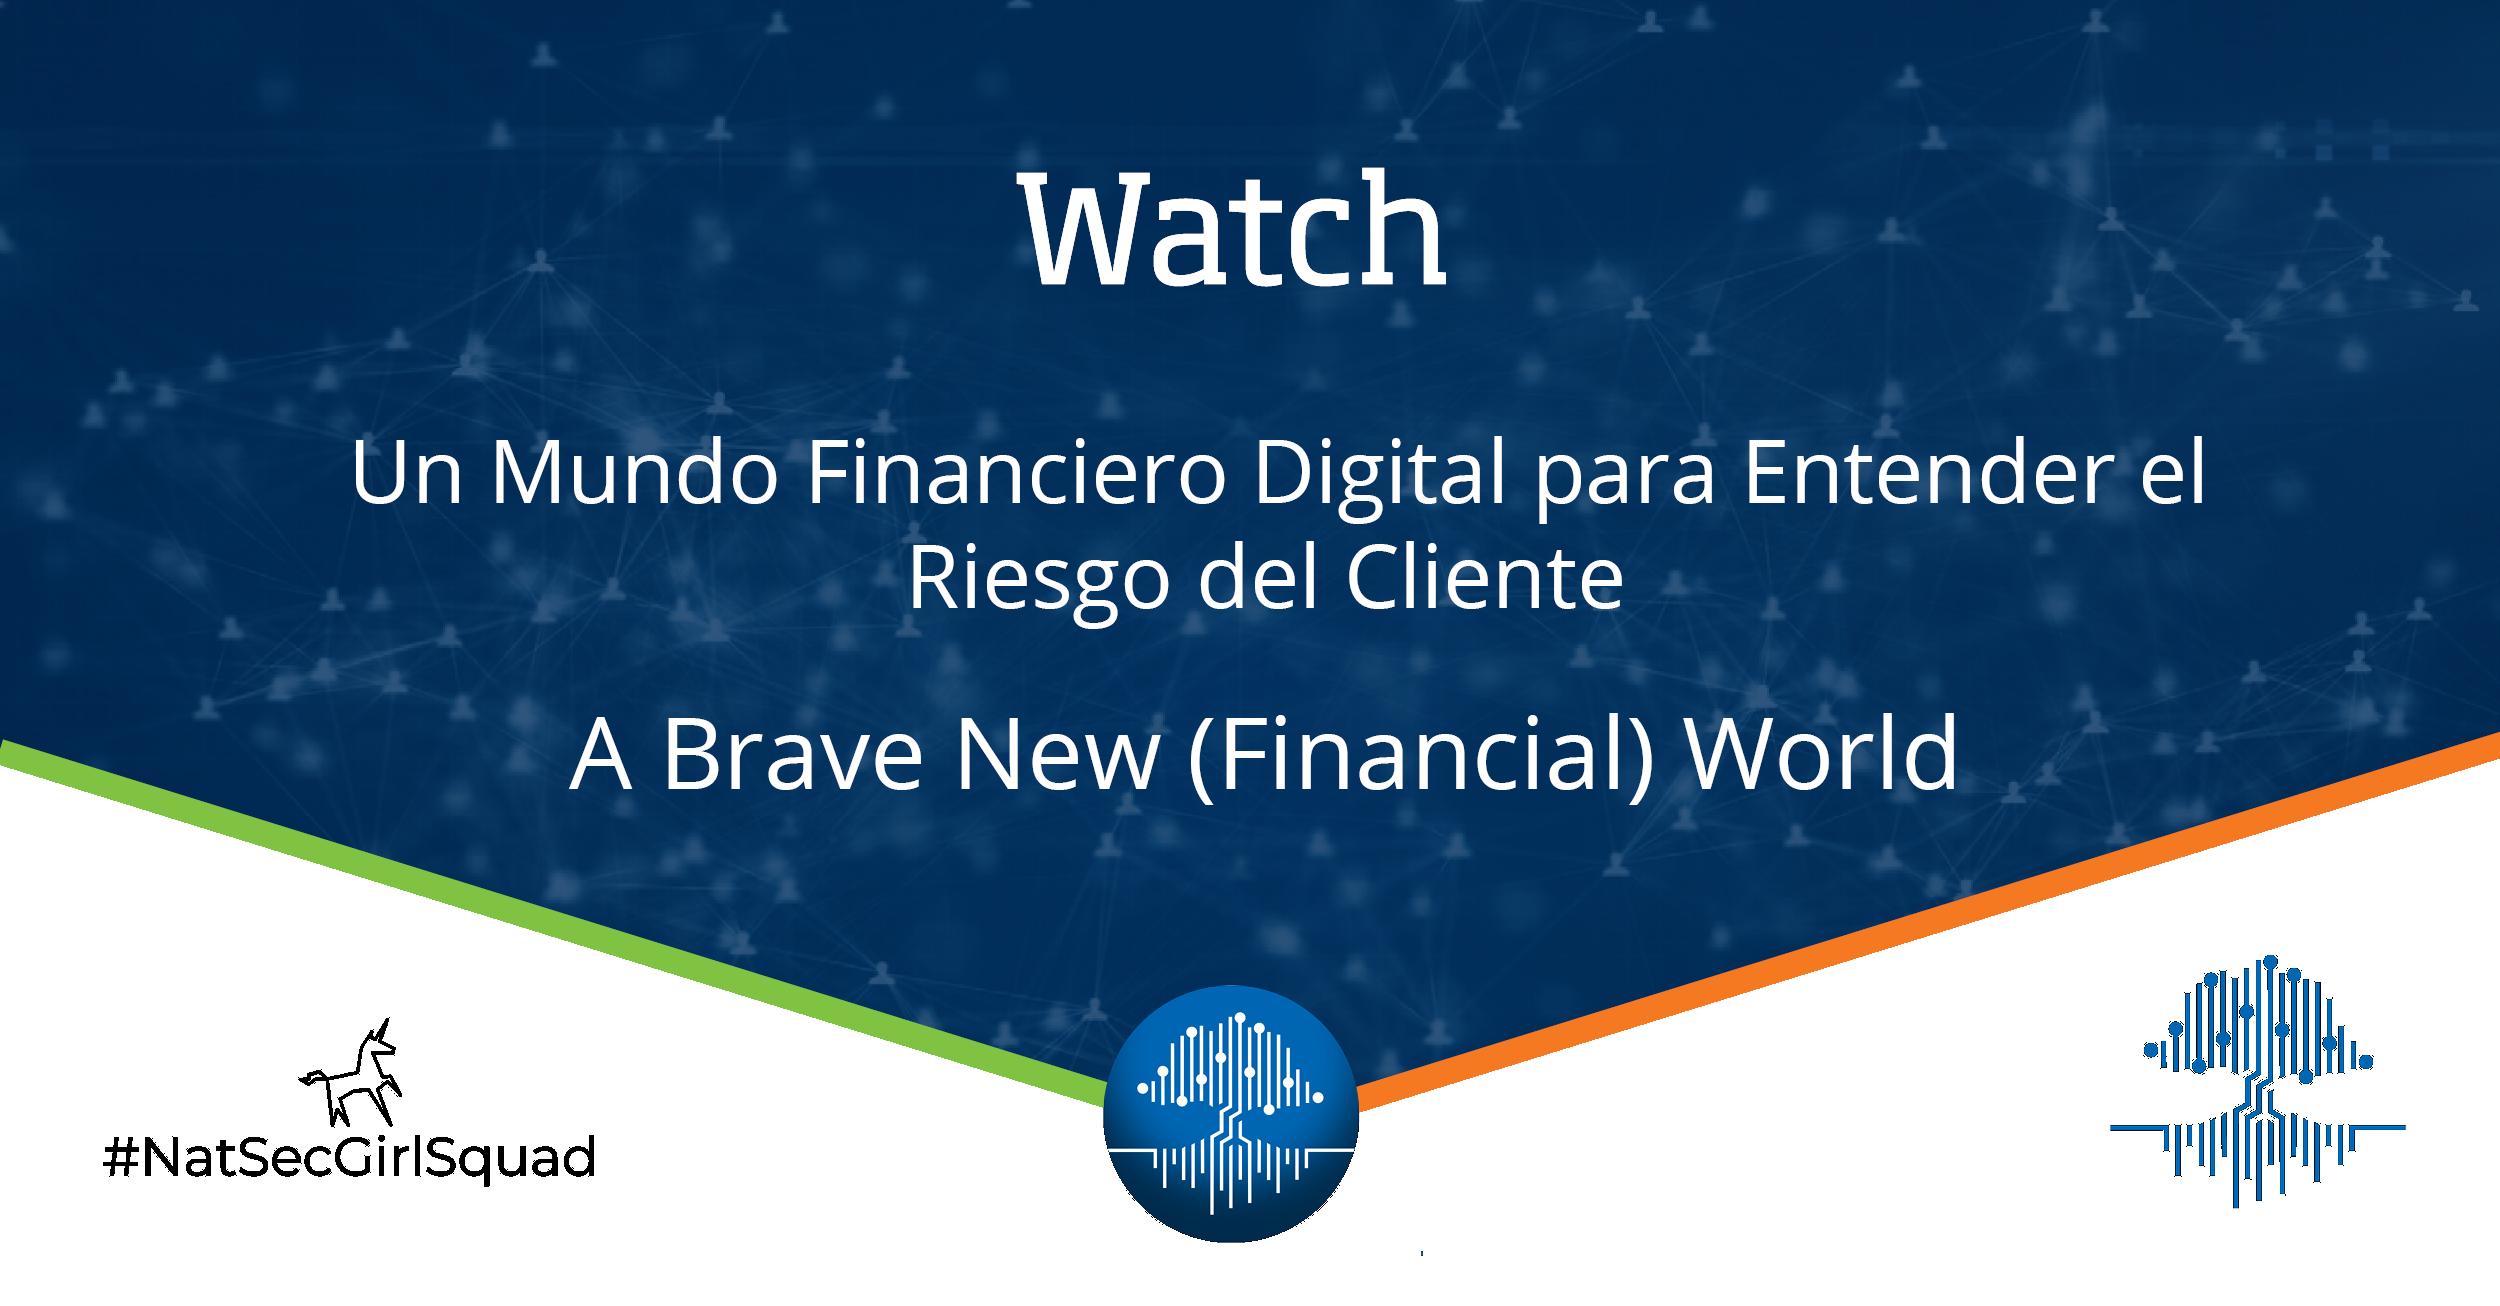 Webinar - A Brave New (Financial) World-20200618 1901-1_1